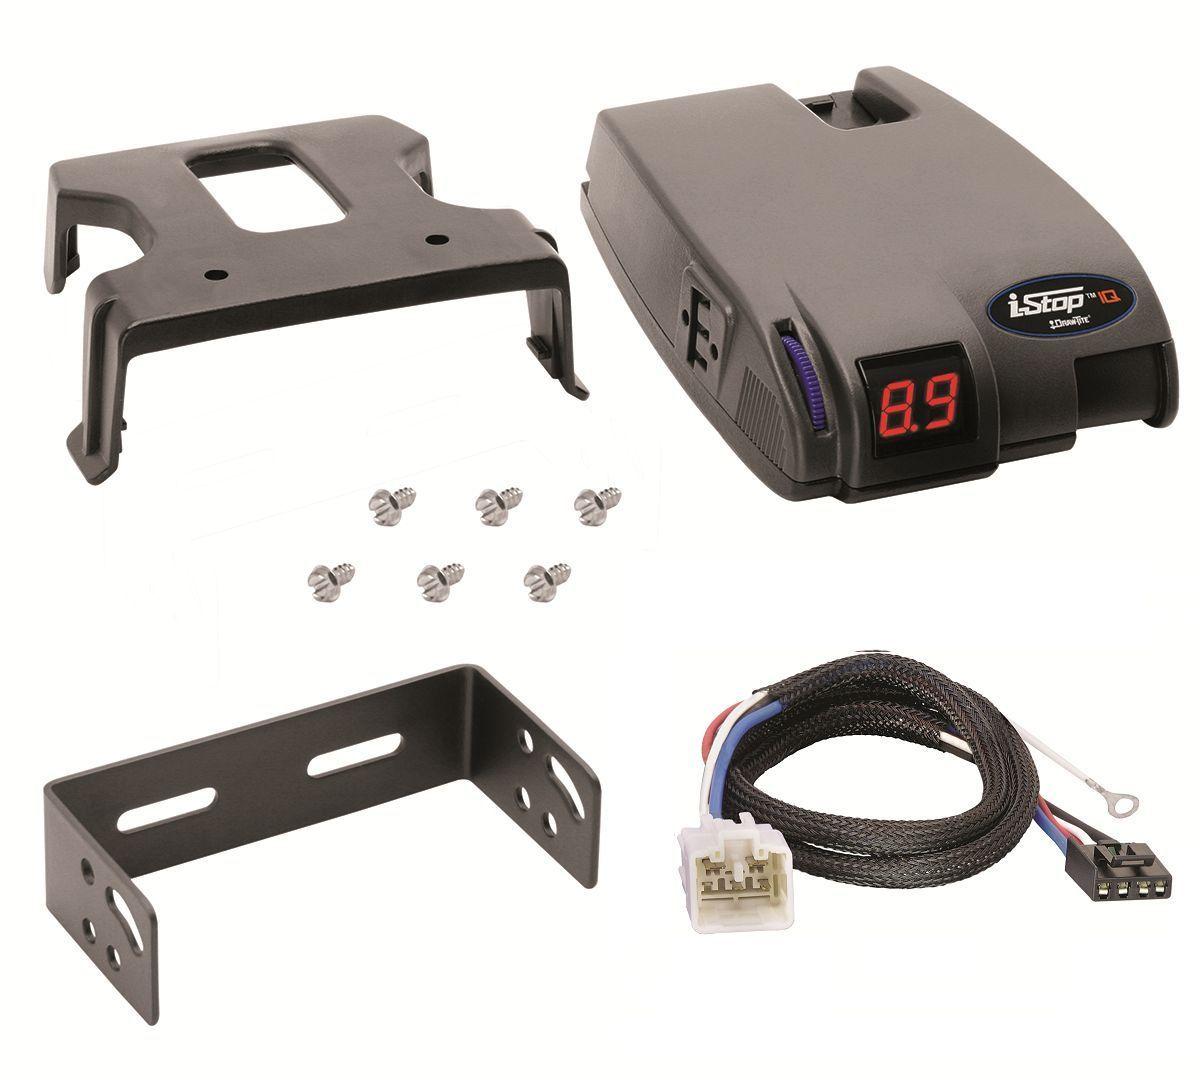 Toyota Trailer Wiring Bracket Real Diagram Box Harness 2014 2016 4runner Draw Tite Brake Control Plug Gm